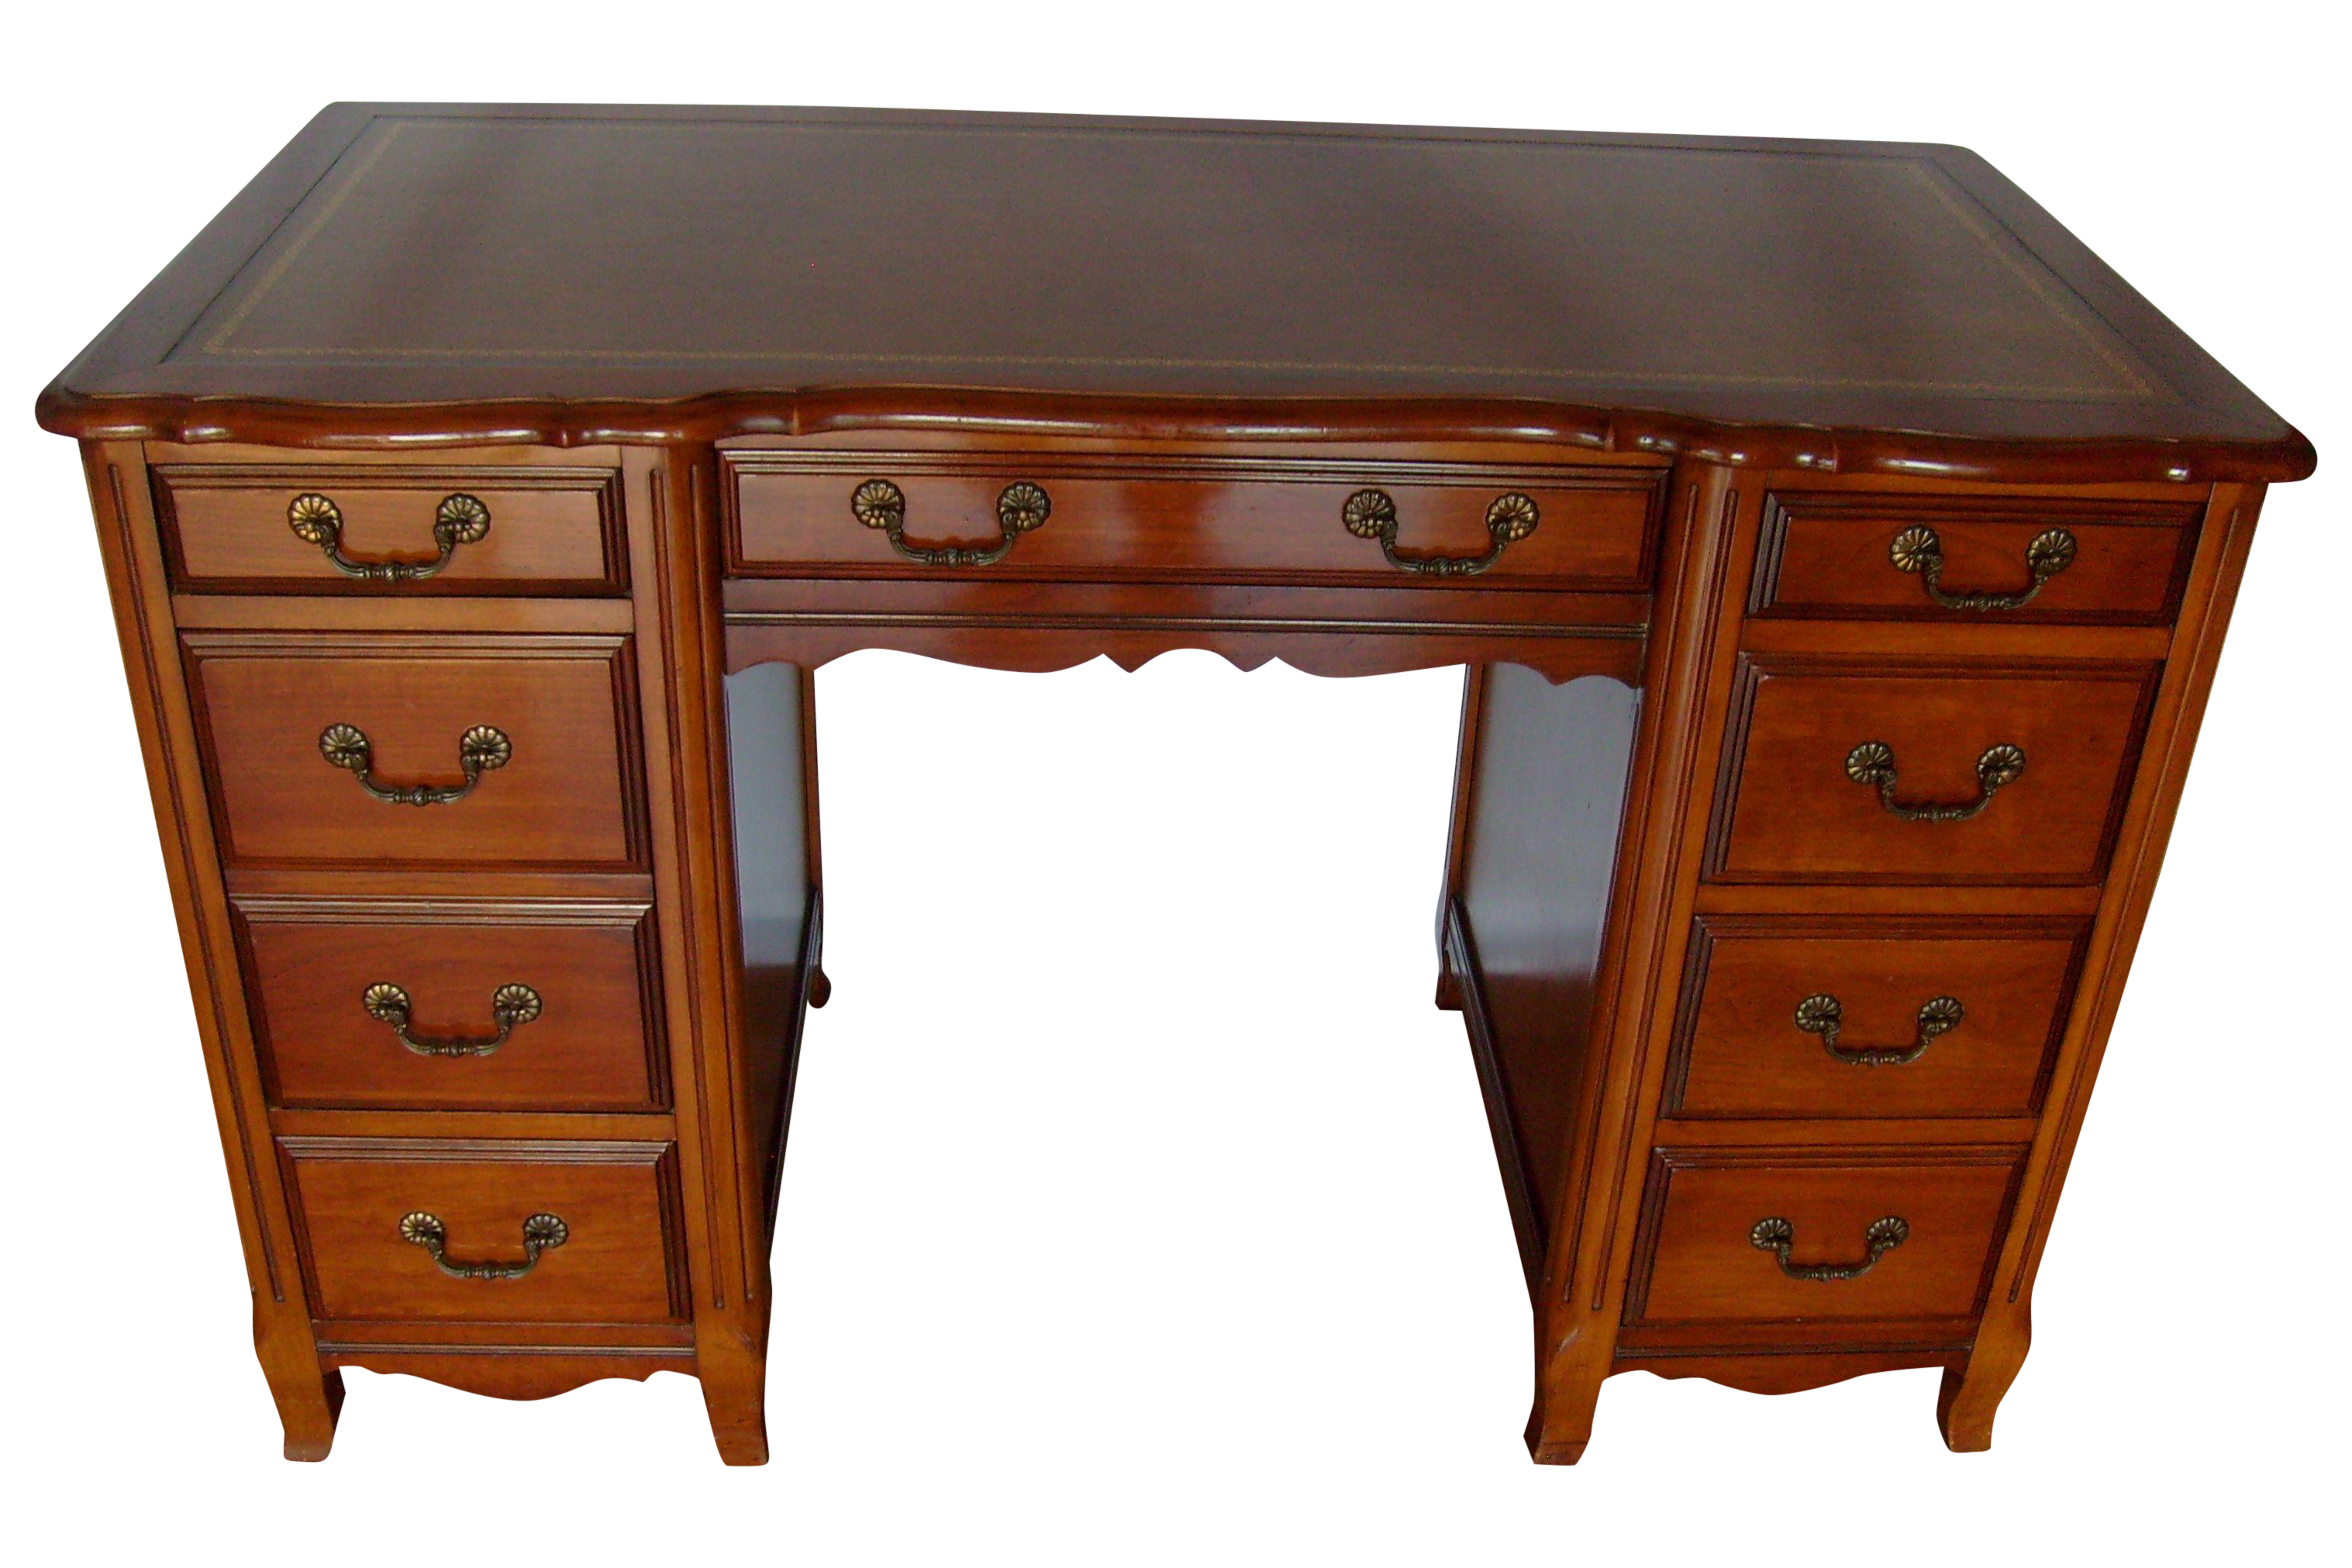 sligh furniture office room. Sligh Furniture Office Room I